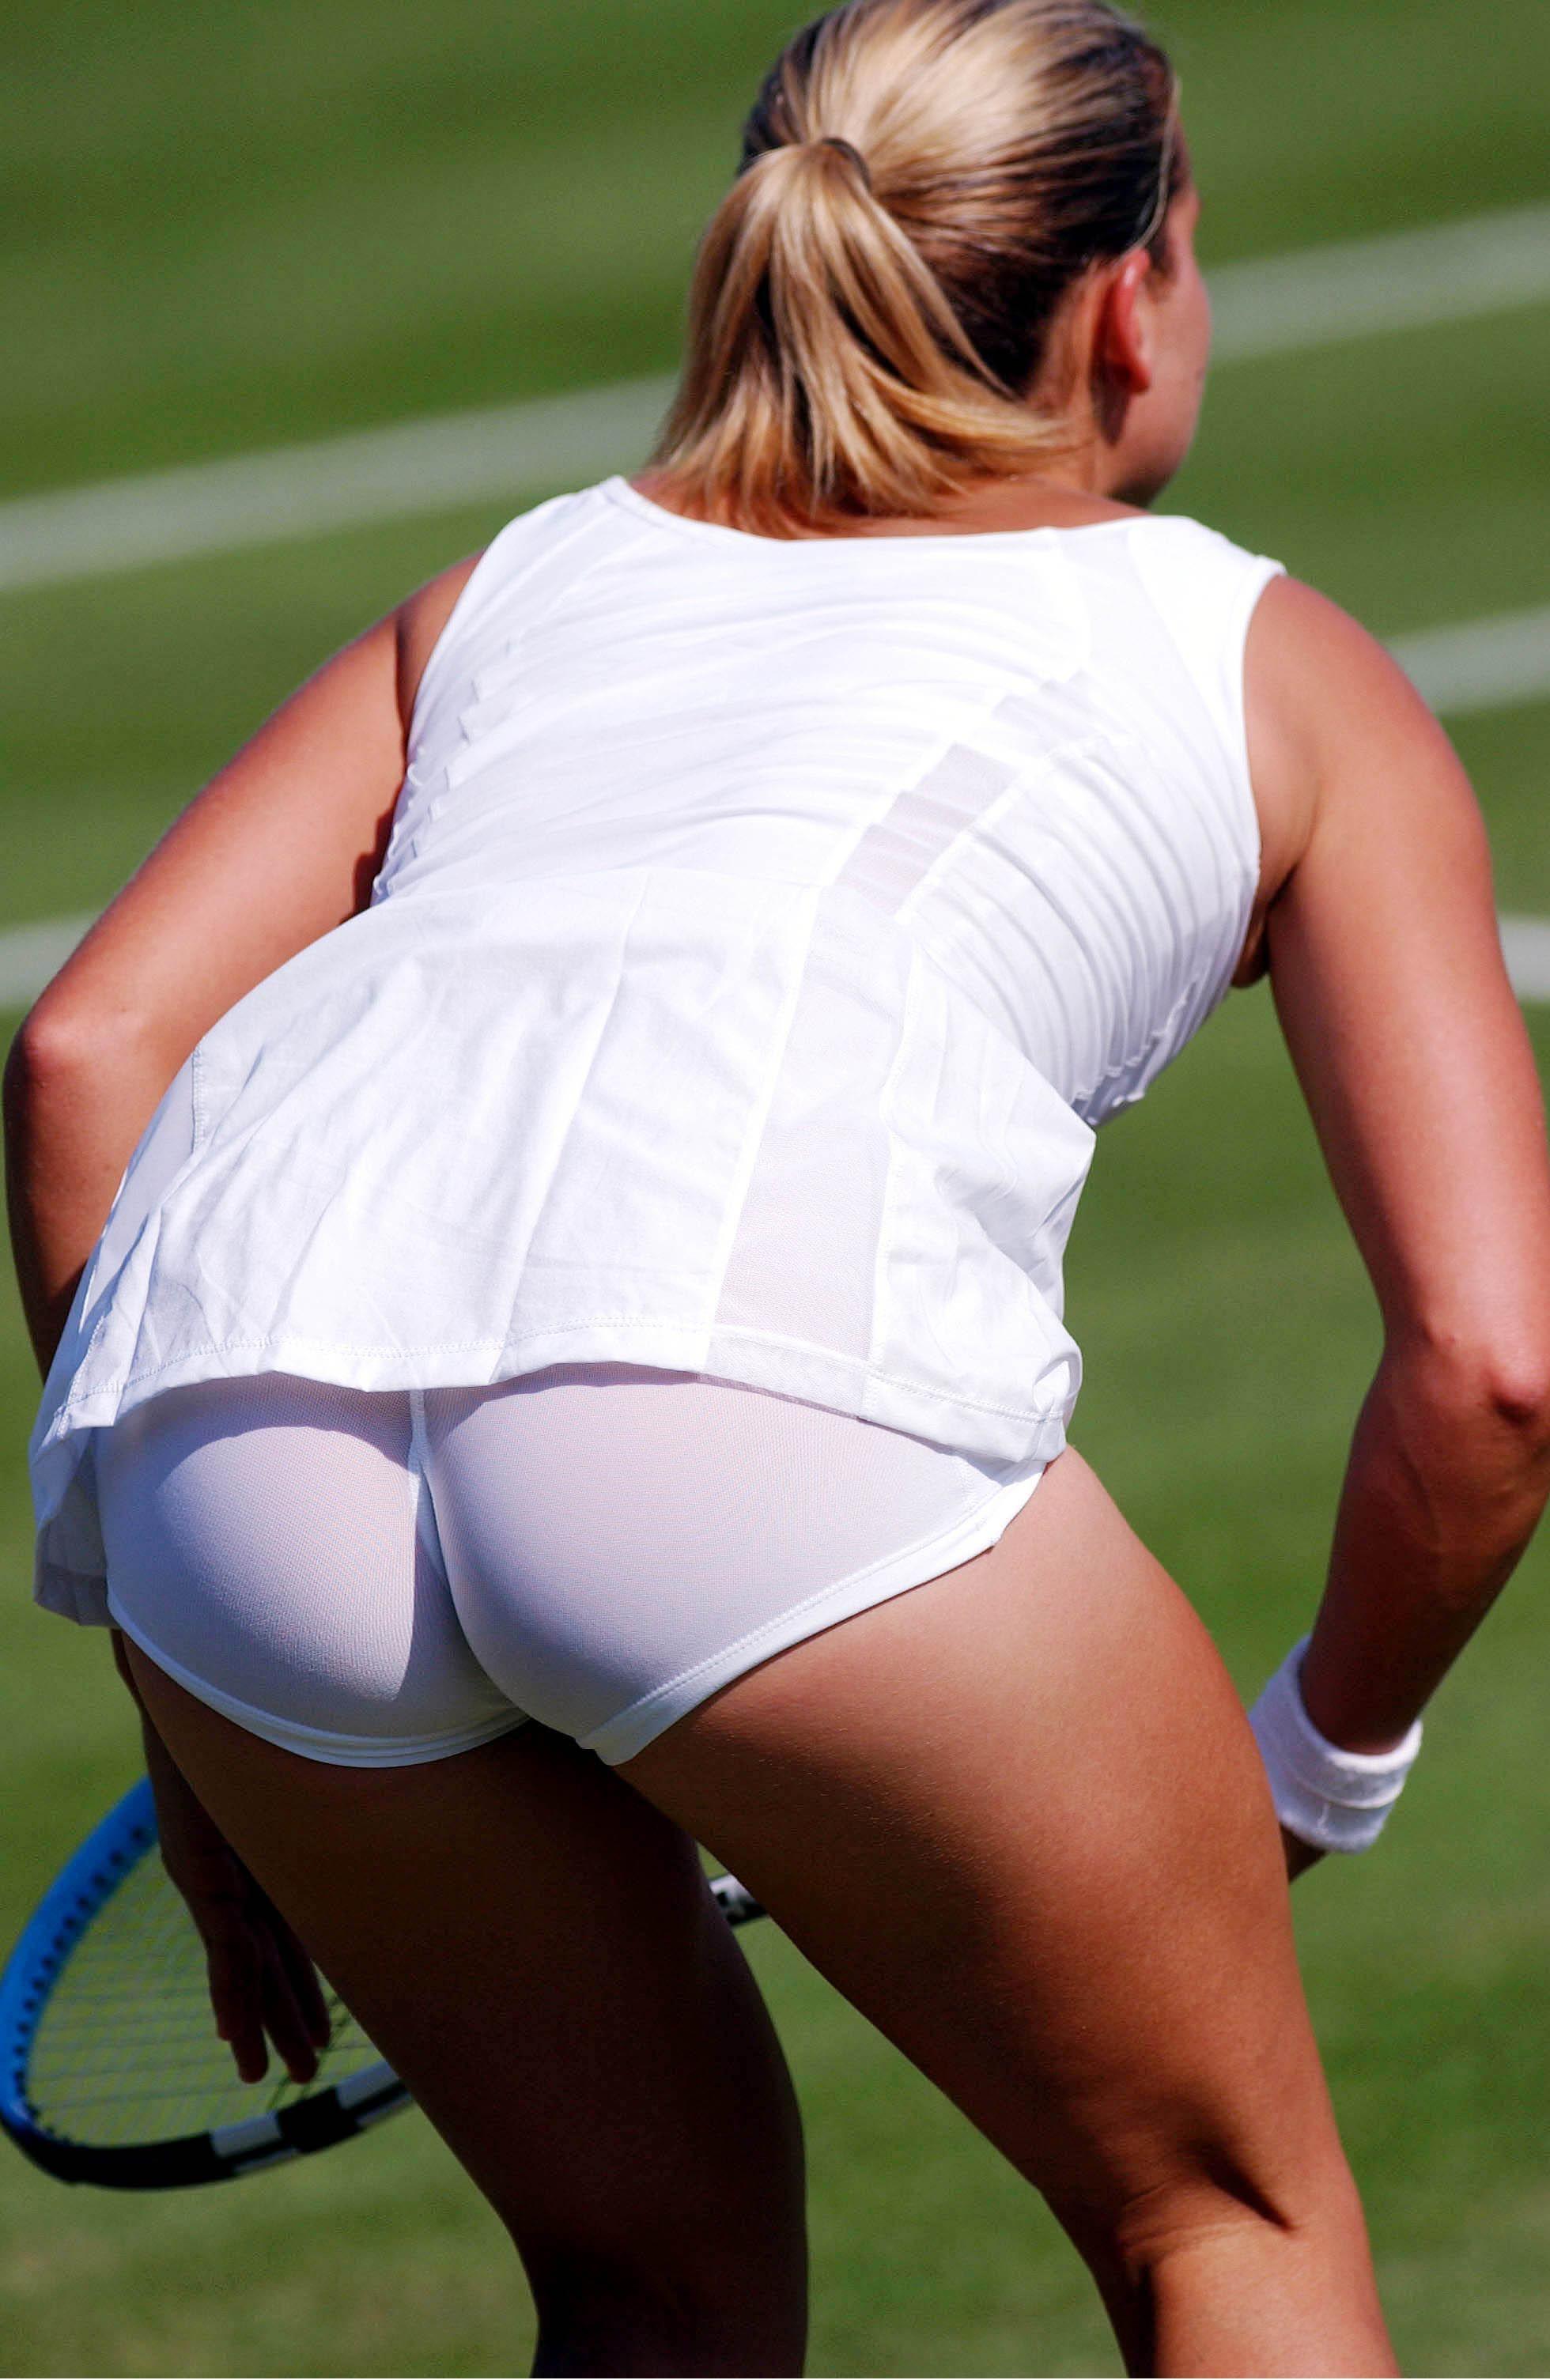 Фото под юбкой тенисисток 7 фотография